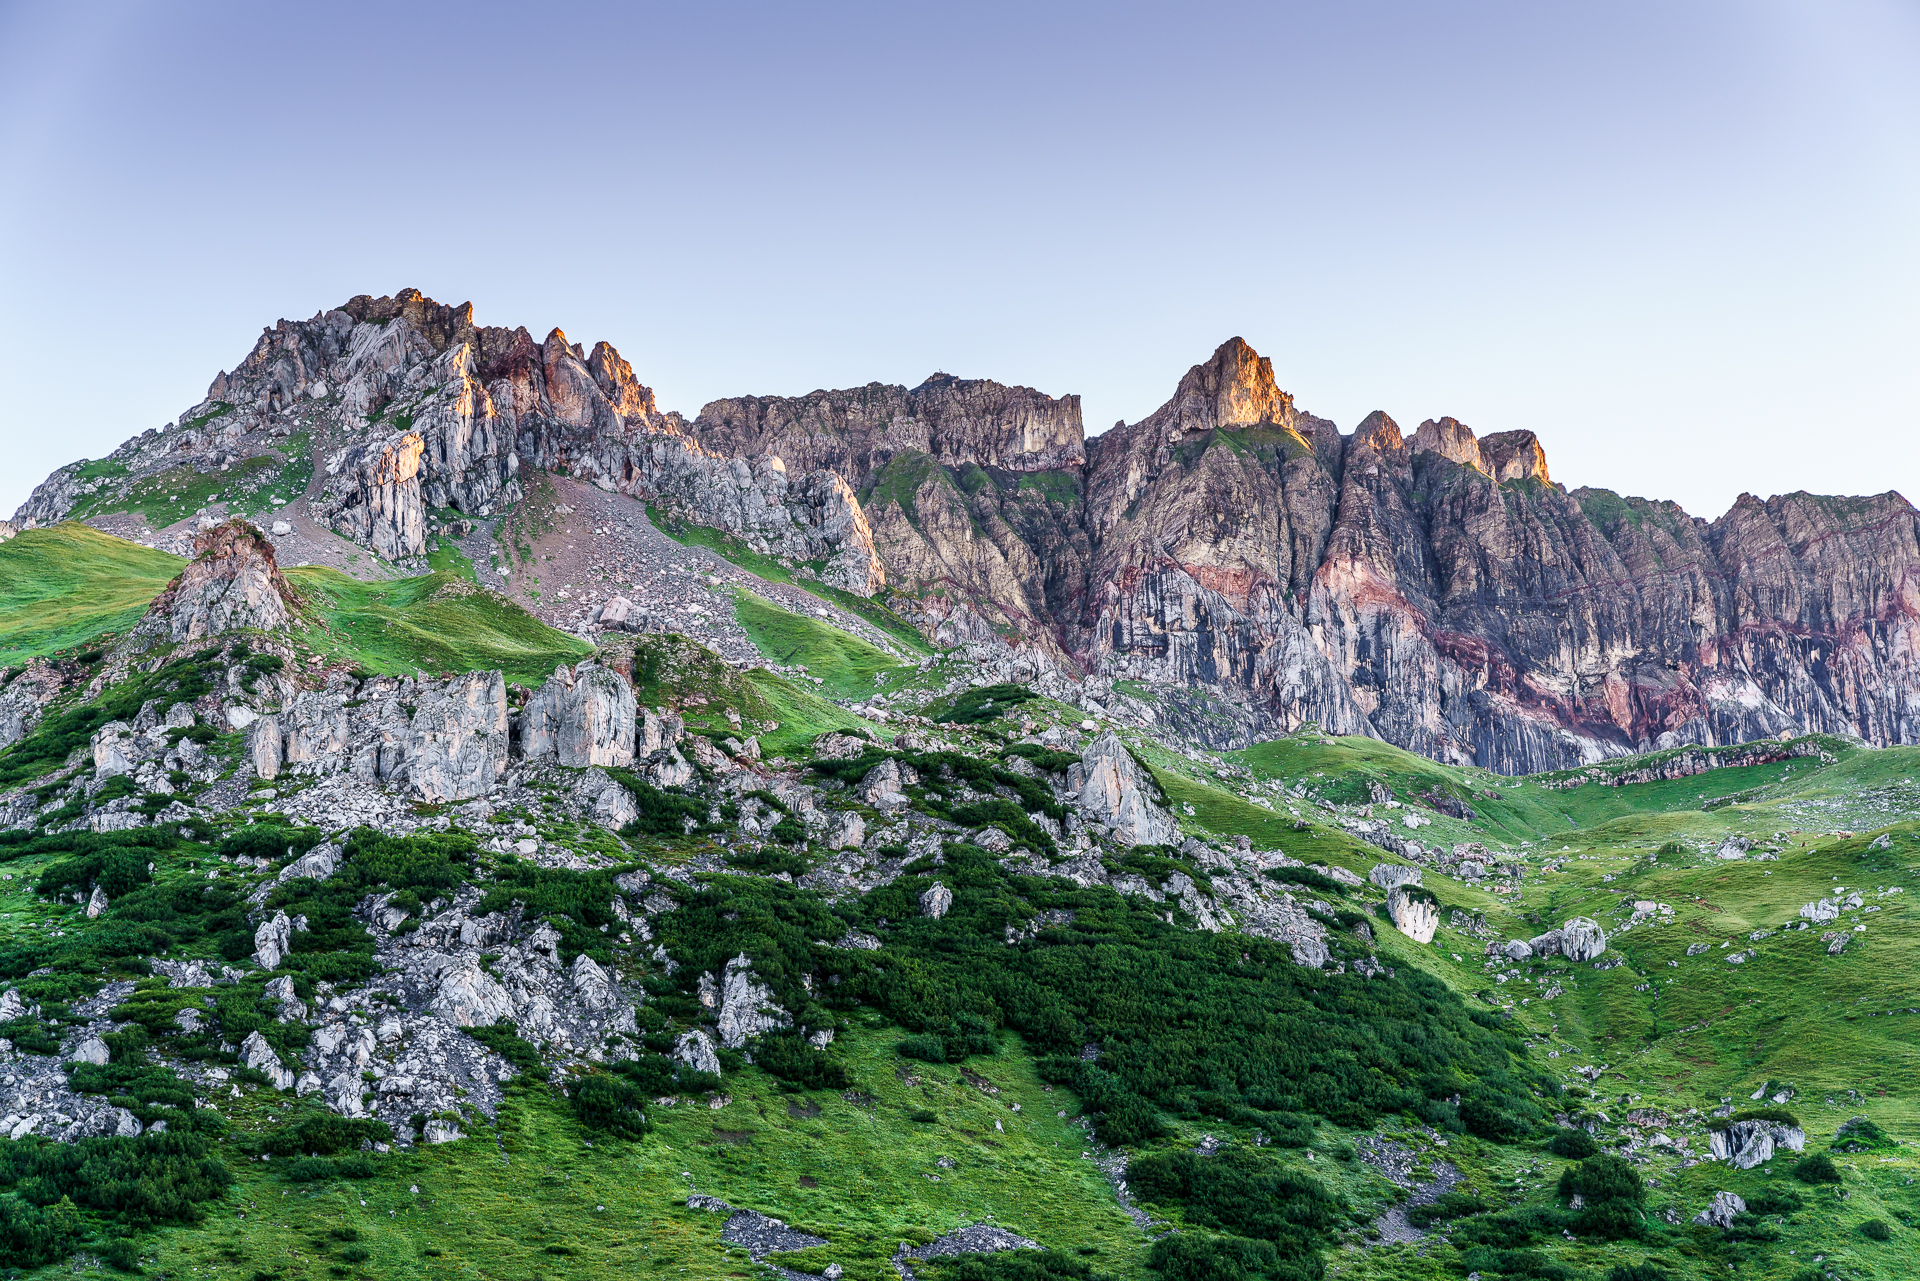 Rote-Wand-Lechquellengebirge